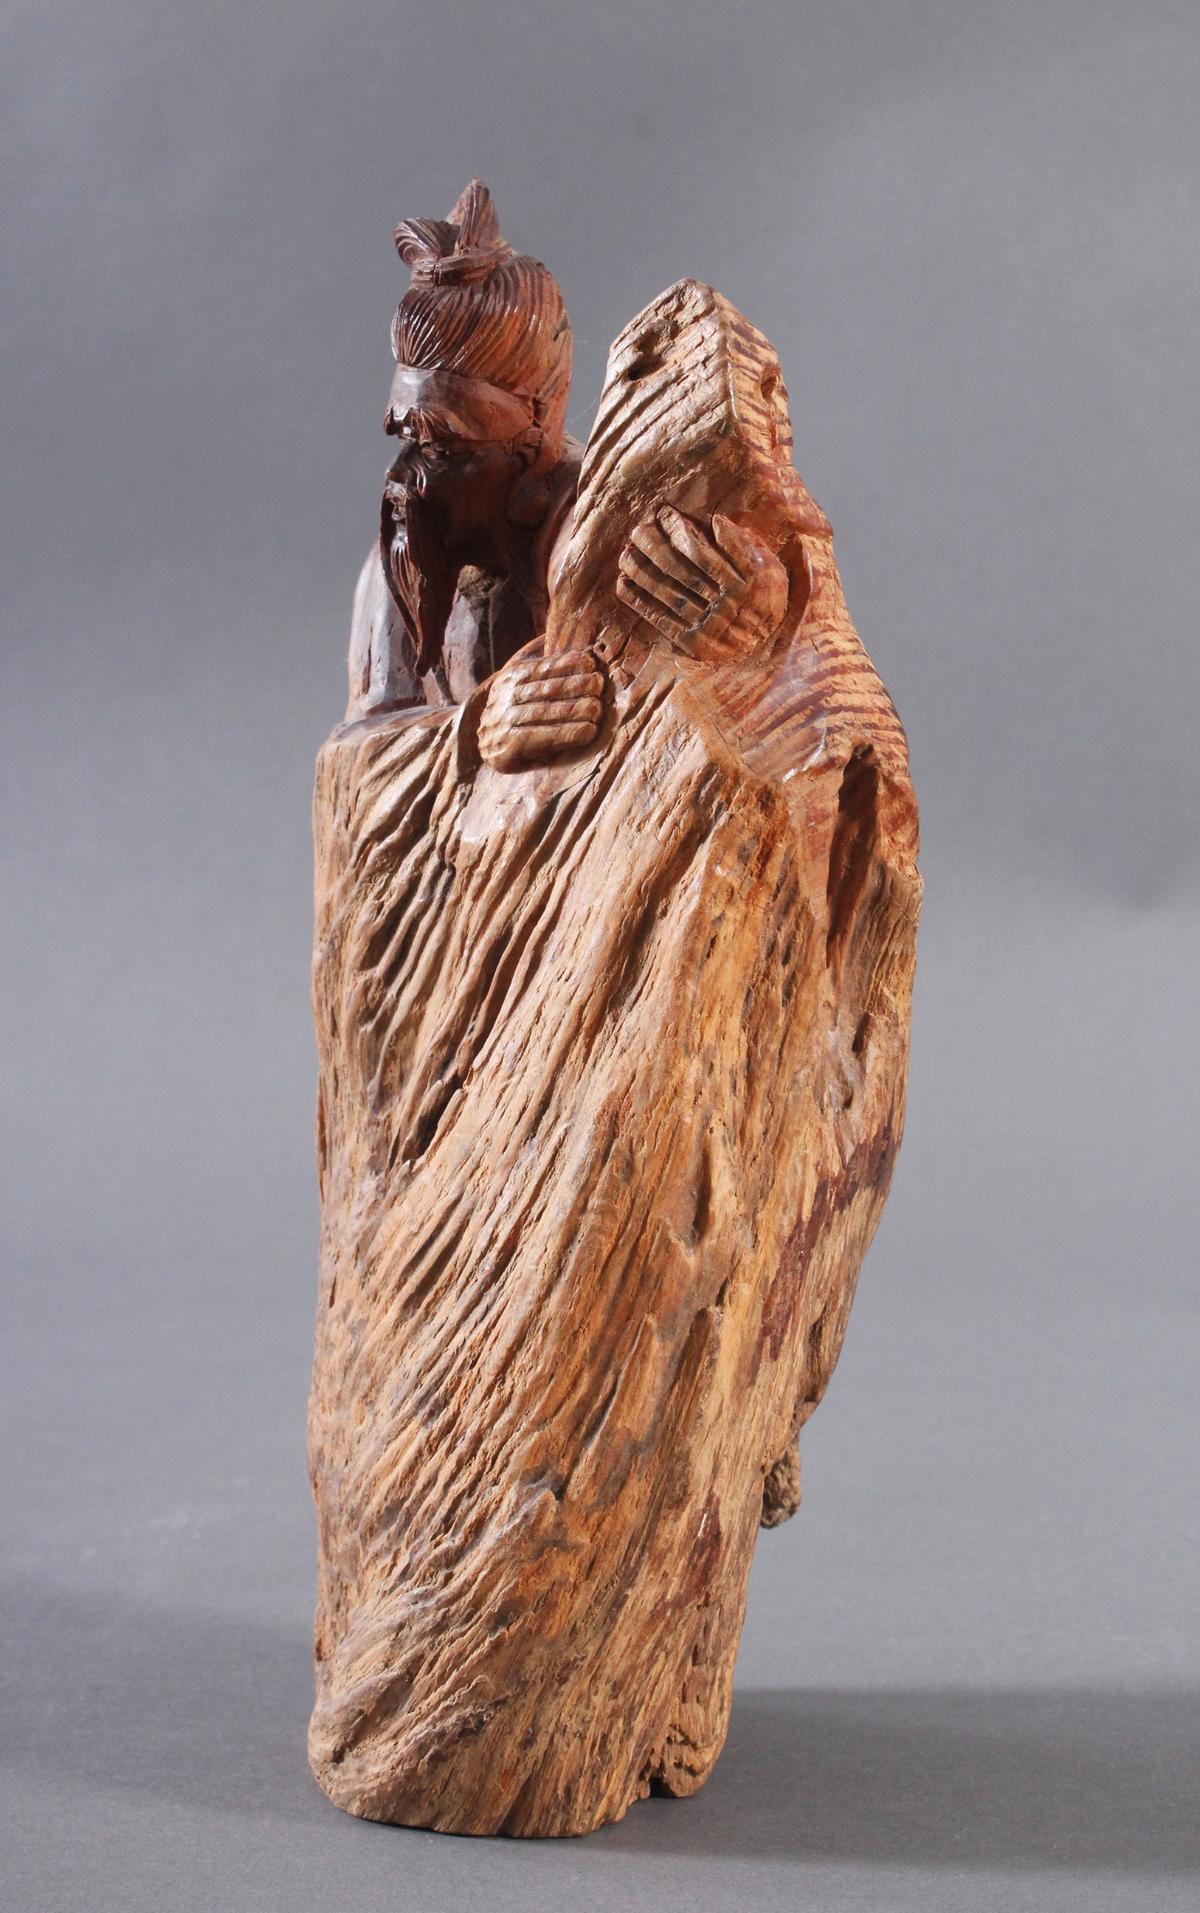 Holzskulptur, China 2. Hälfte 20. Jh. Mann mit Bart-4